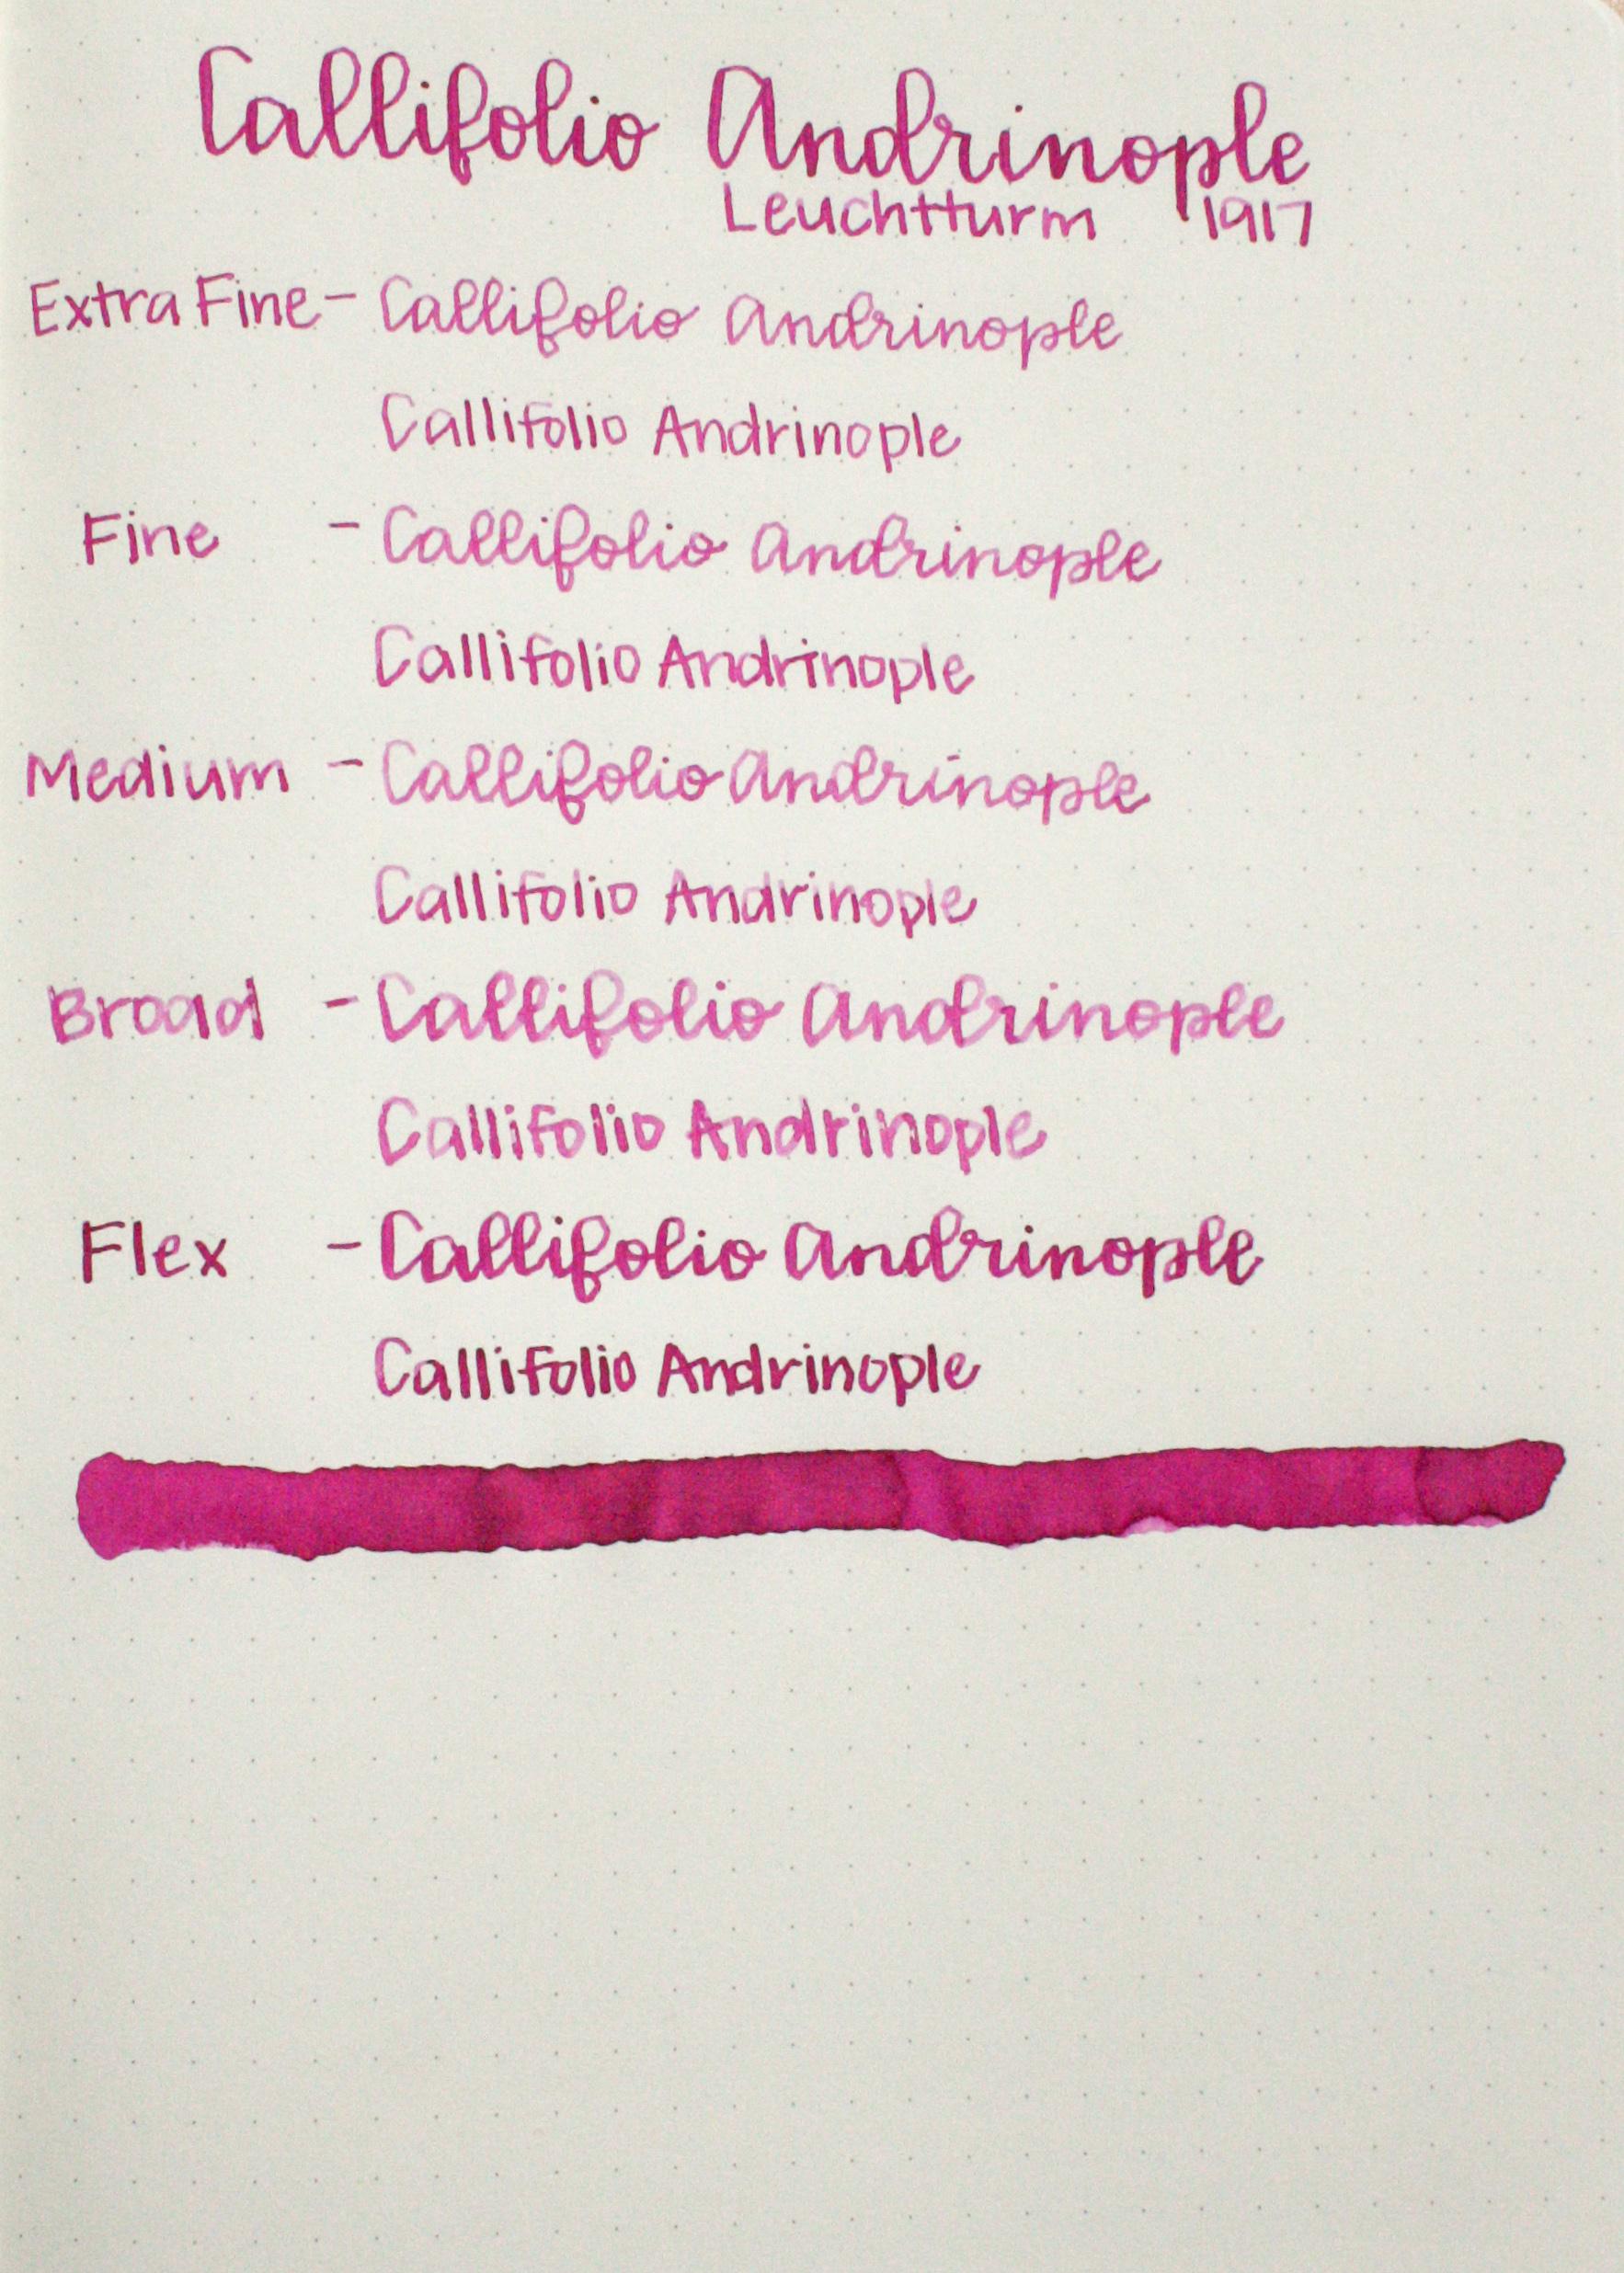 CallifolioAndrinople-039.jpg